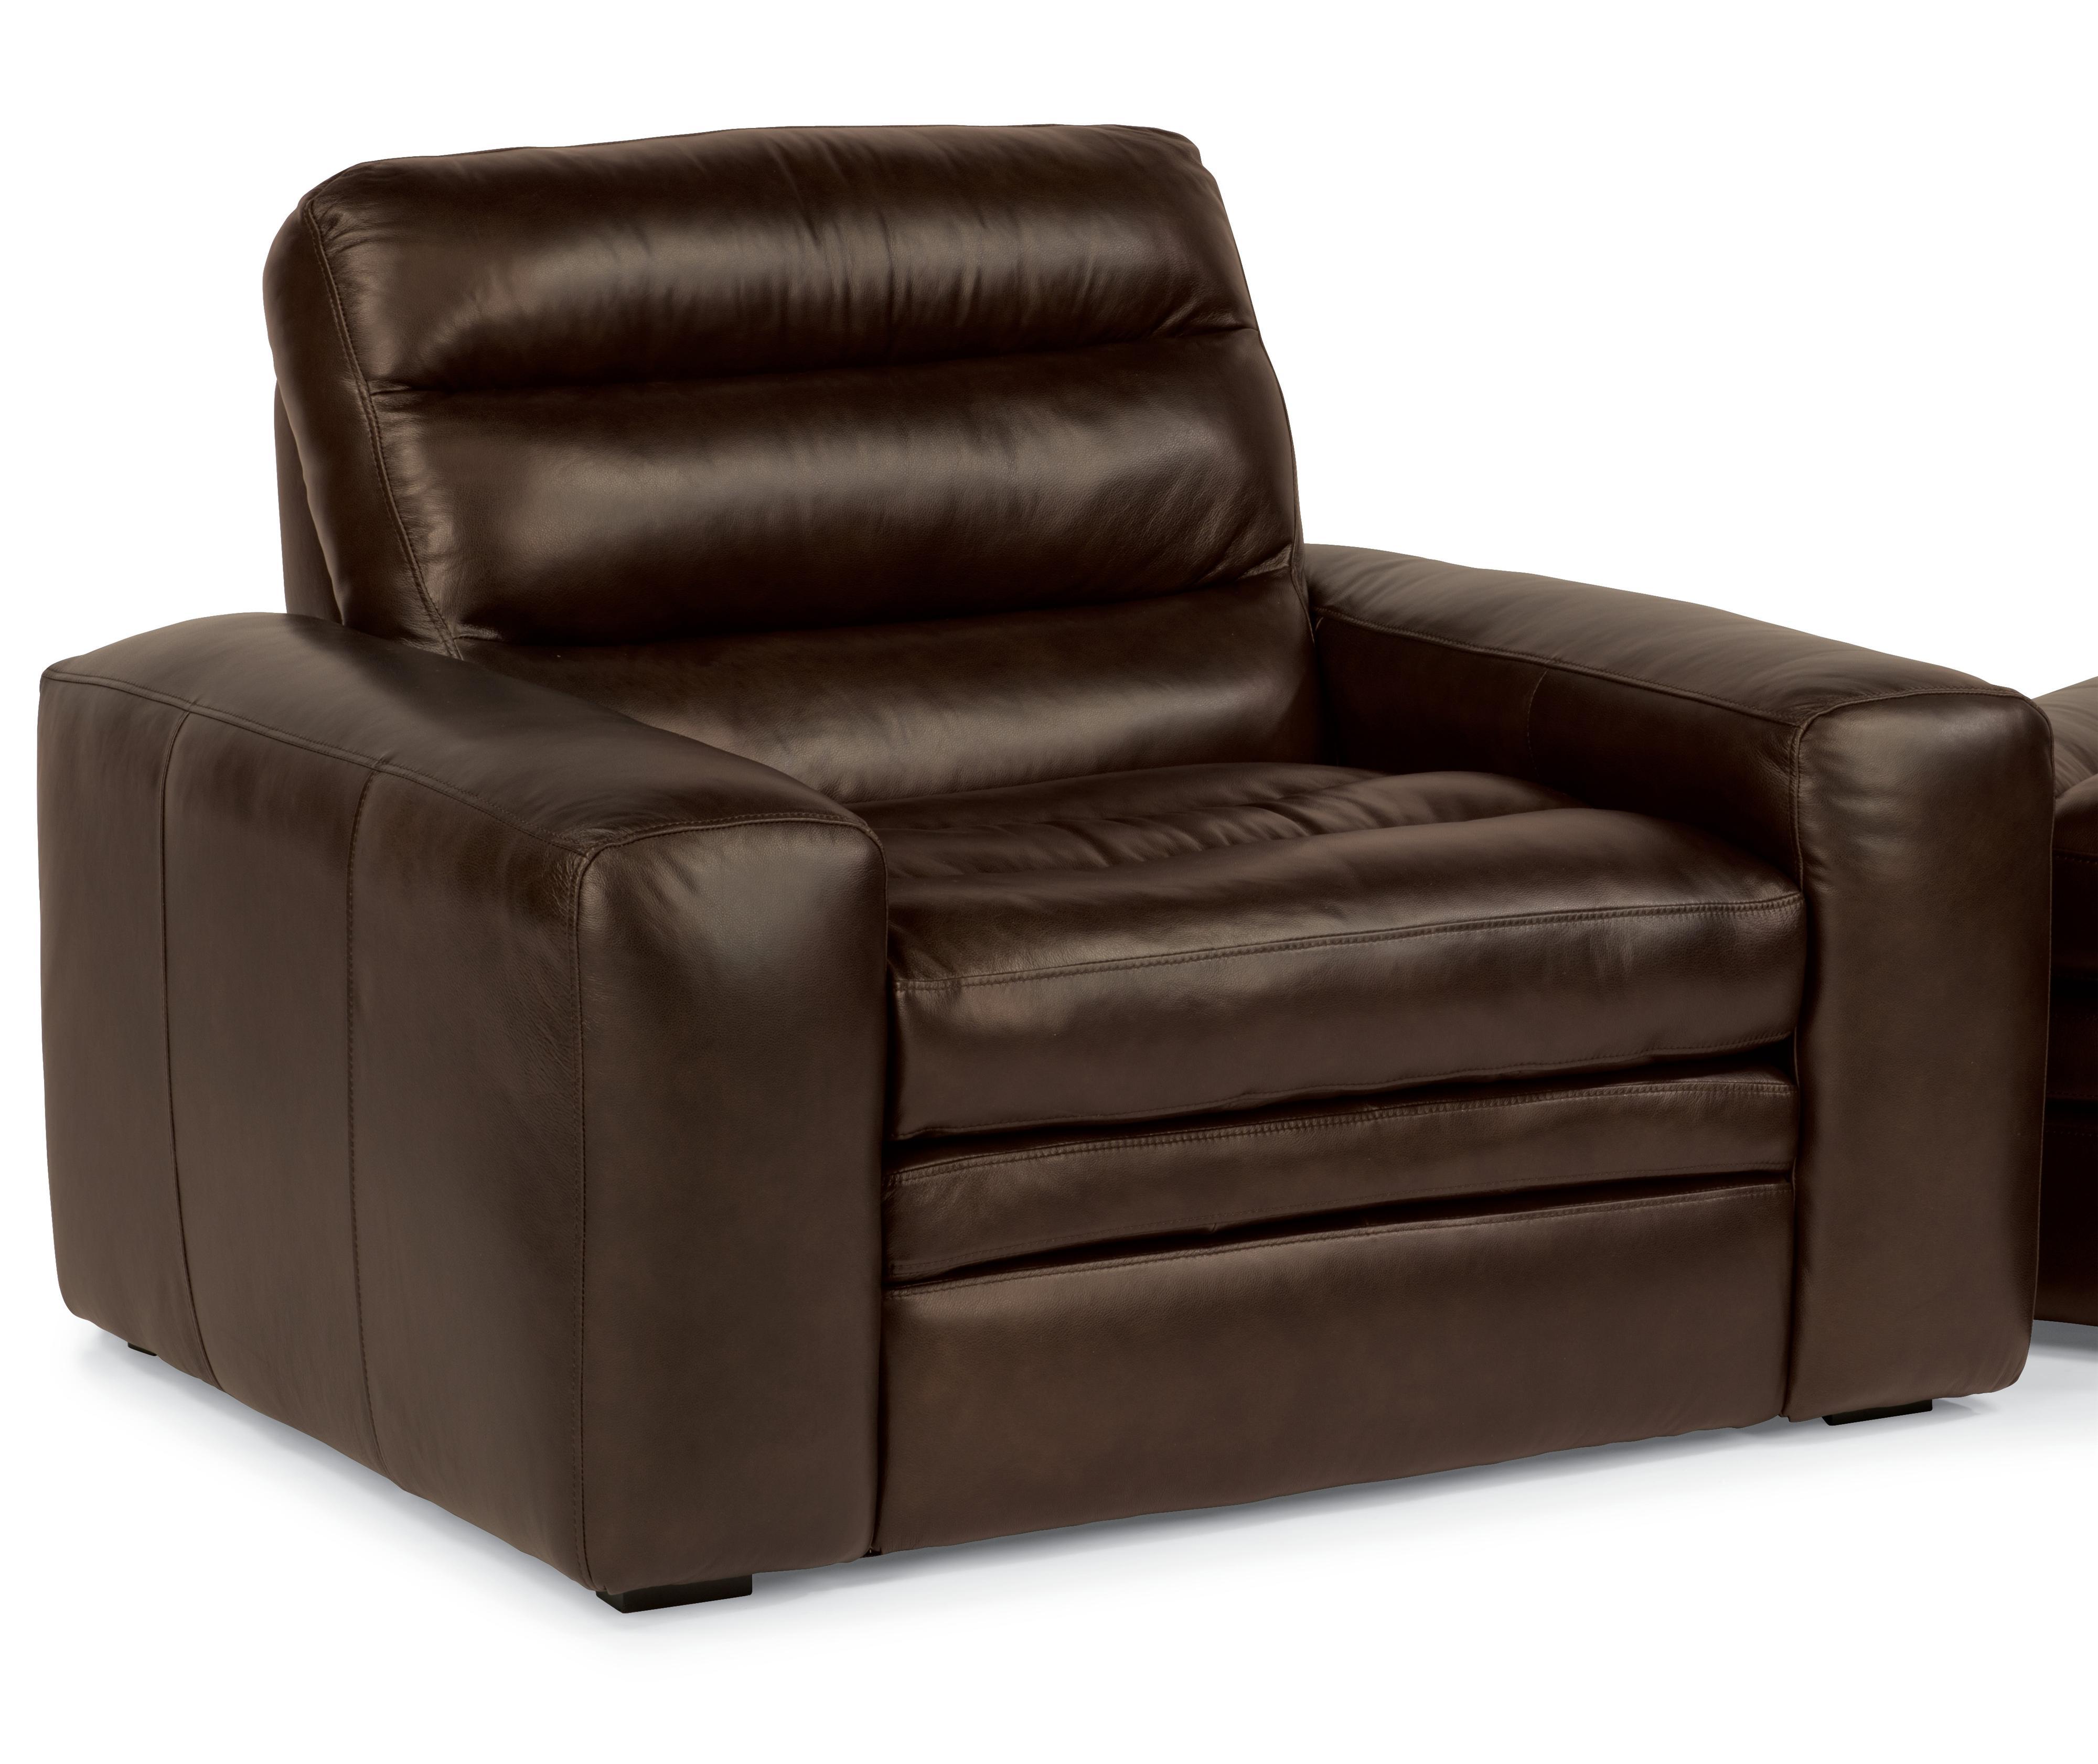 Flexsteel Latitudes - Mariah Chair - Item Number: 1451-10-740-70